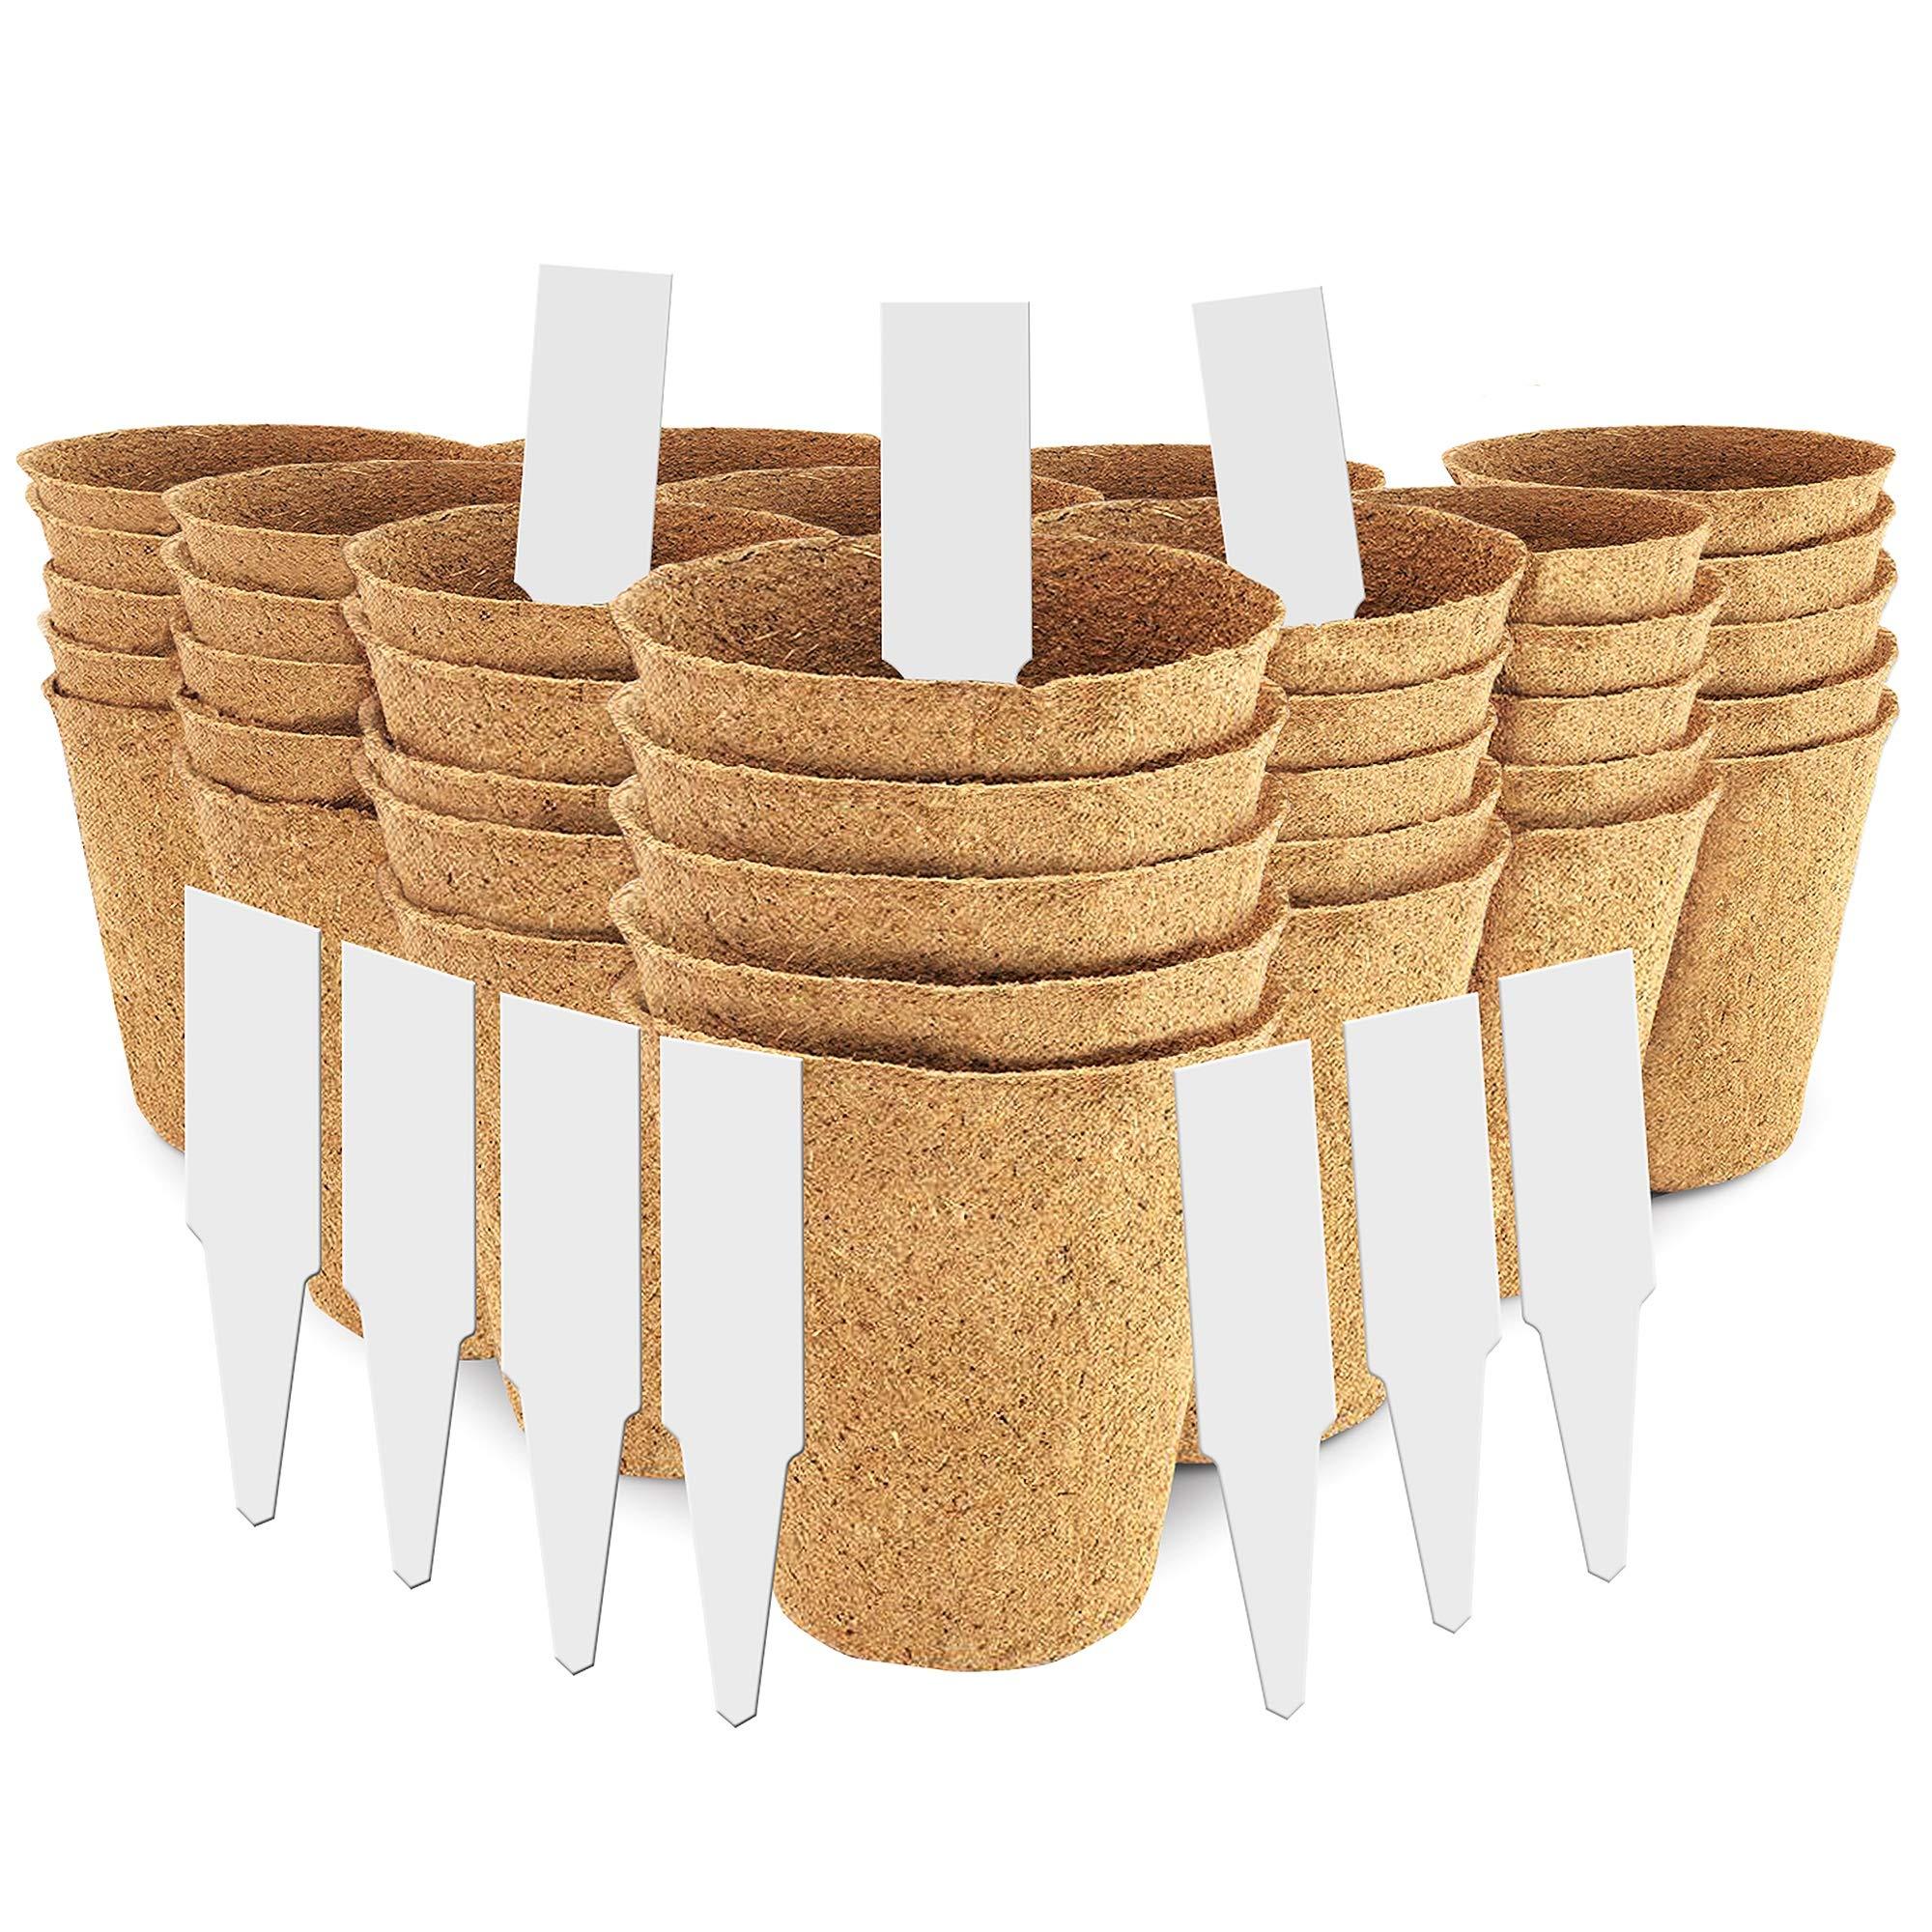 "3"" Peat Pots   Plant Starters   Seedling & Herb Seed Starter Kit - Organic Biodegradable Pots 100% Eco-Friendly Enhance Aeration   BONUS 10 Plastic Plant Markers – Bulk 60 Pack, 3 inch"